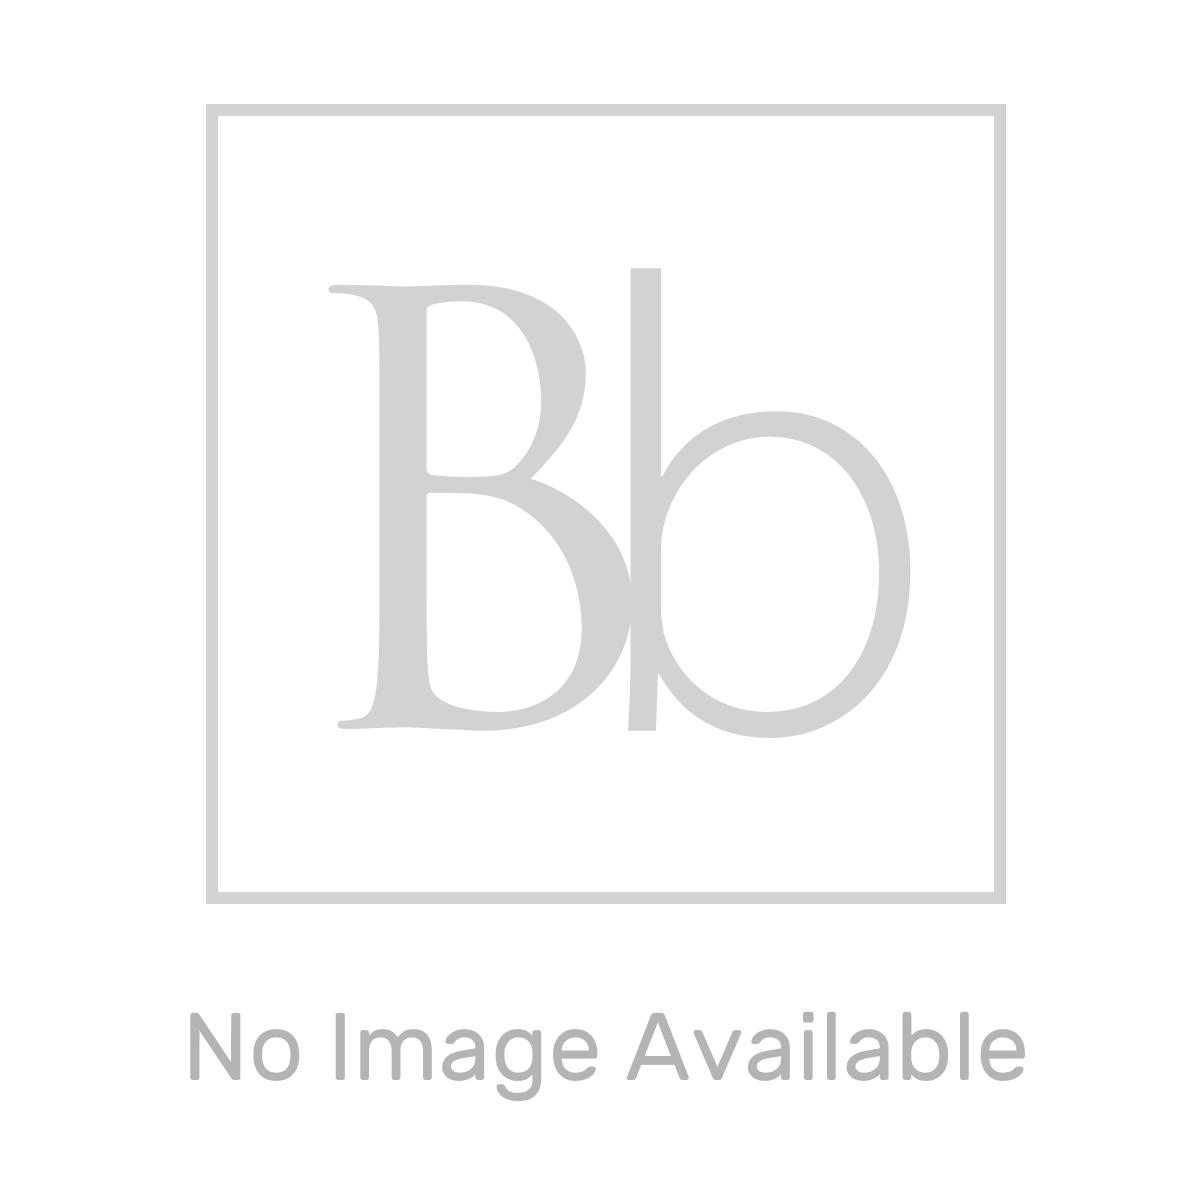 Nuie Athena Hacienda Black 2 Drawer Floor Standing Vanity Unit with 18mm Worktop 600mm